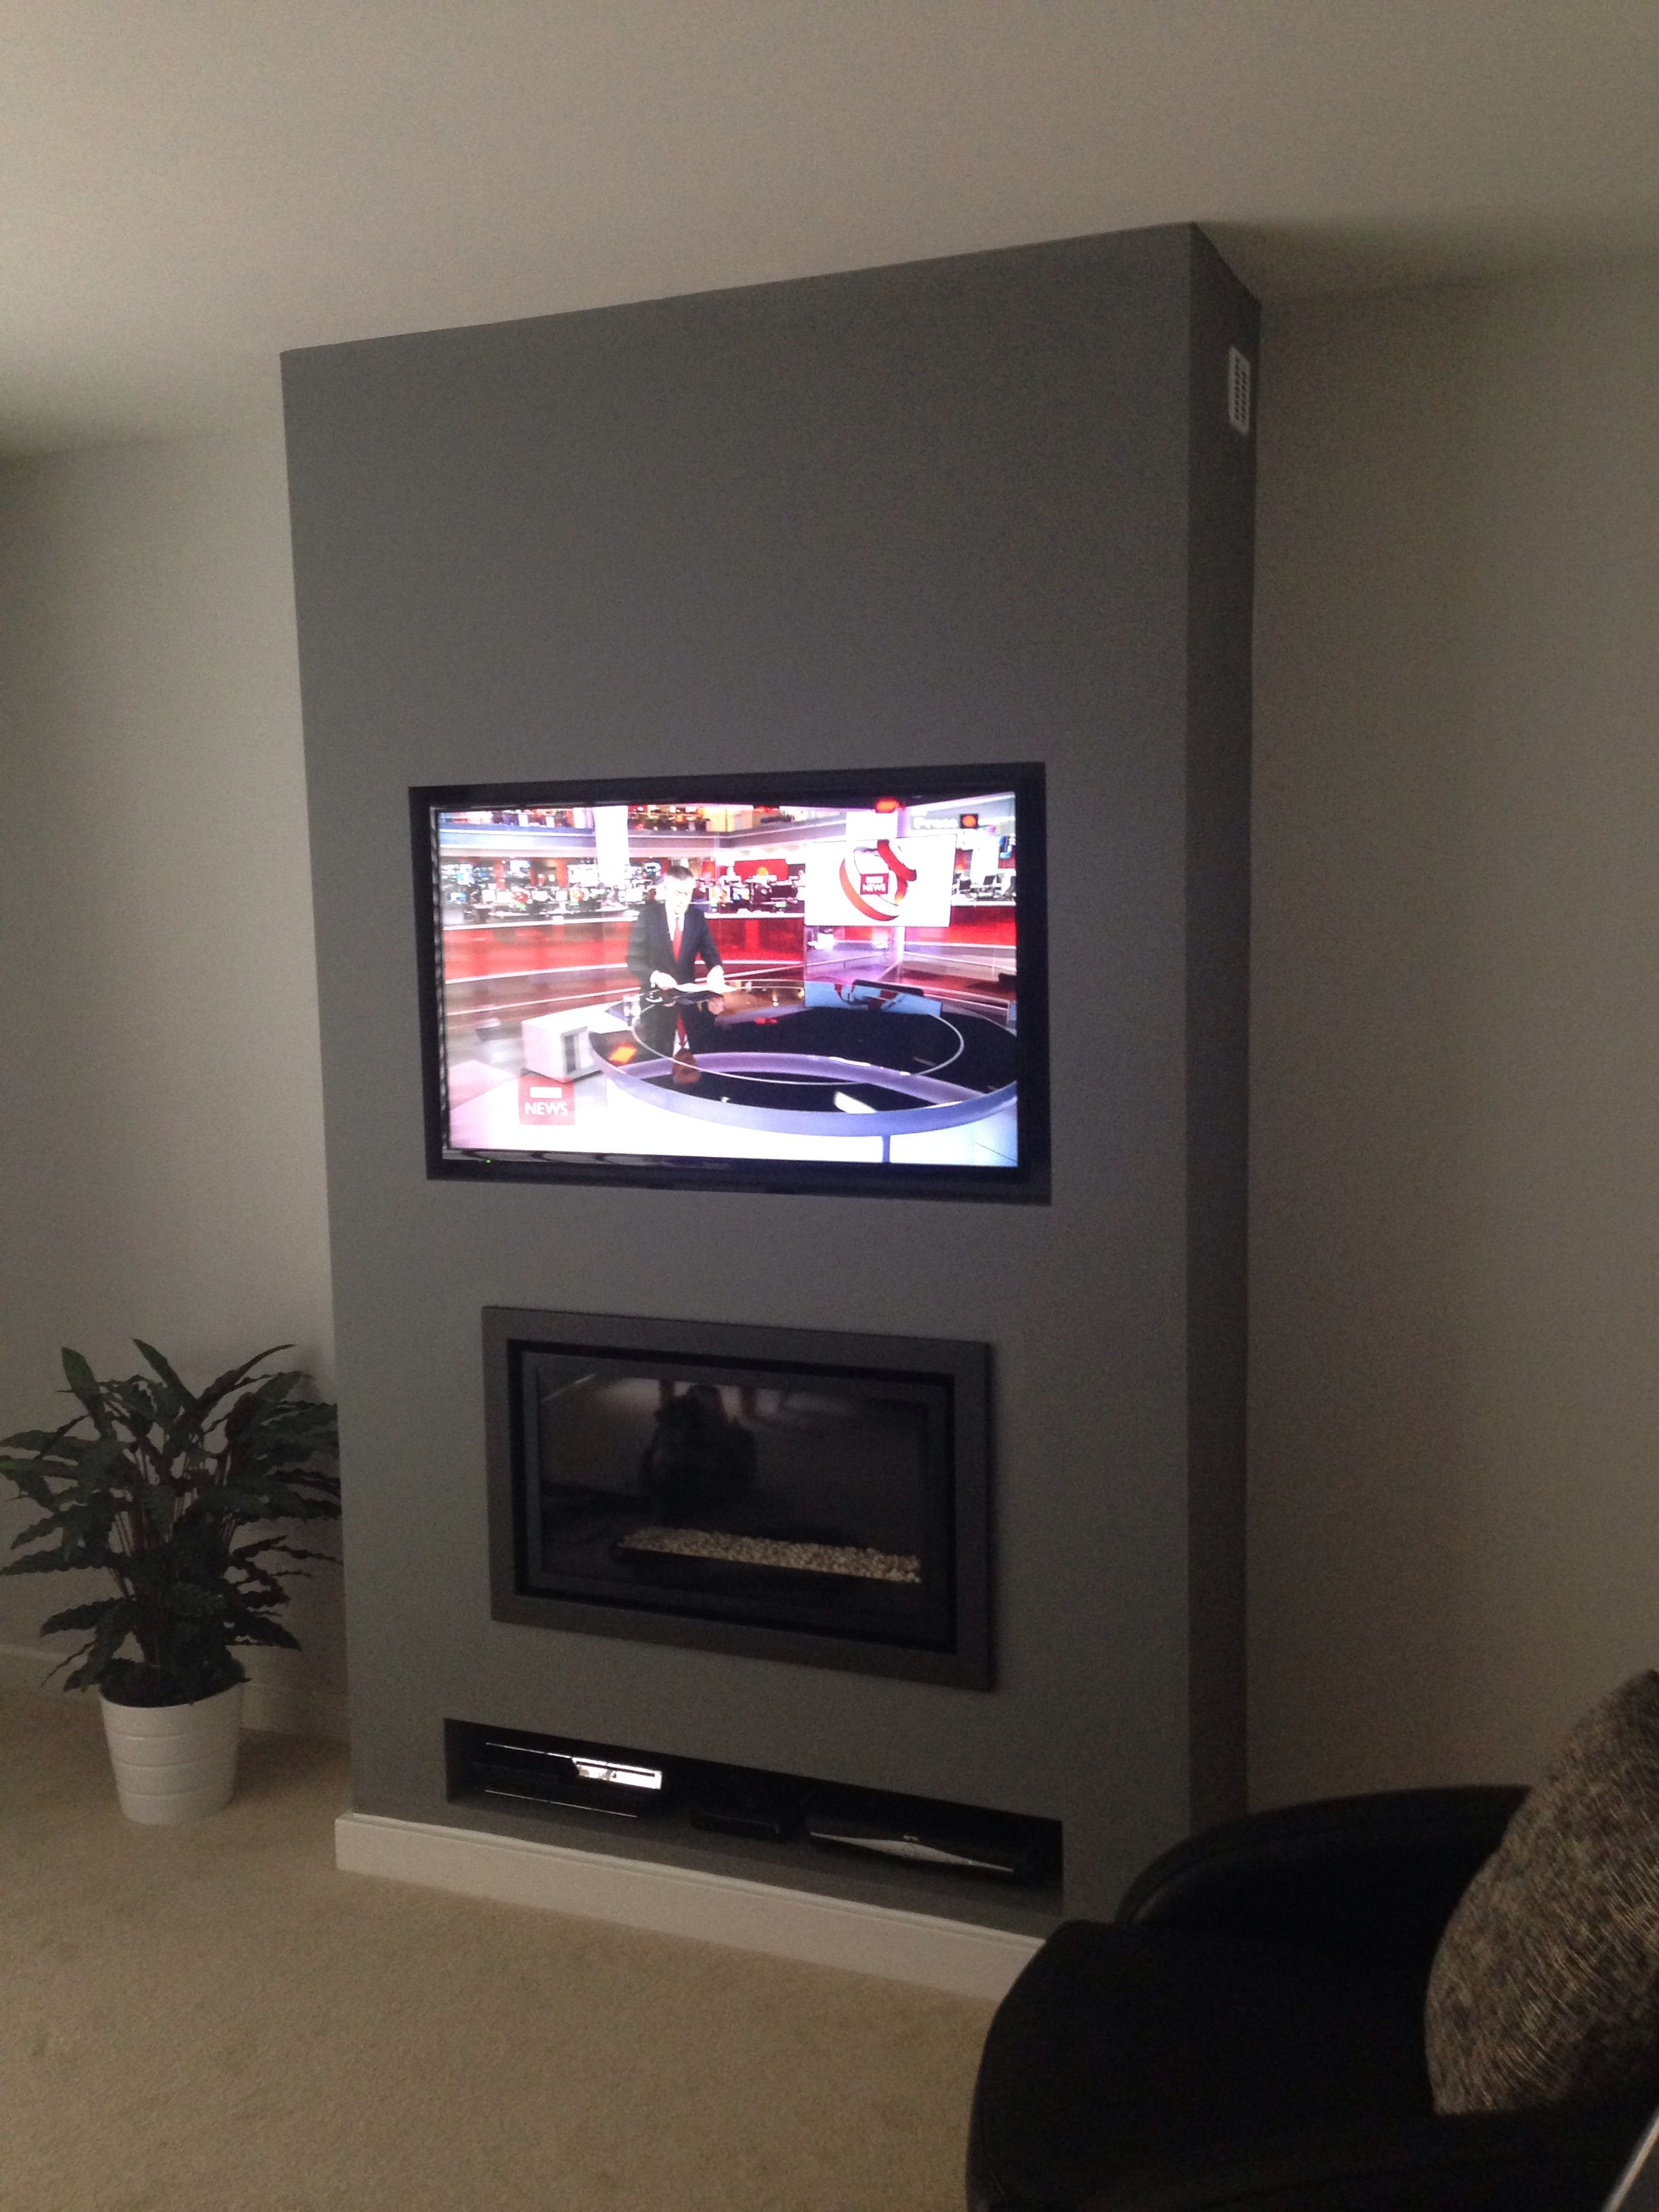 Riva Studio Balance Flue Fire With Panasonic Tv Above